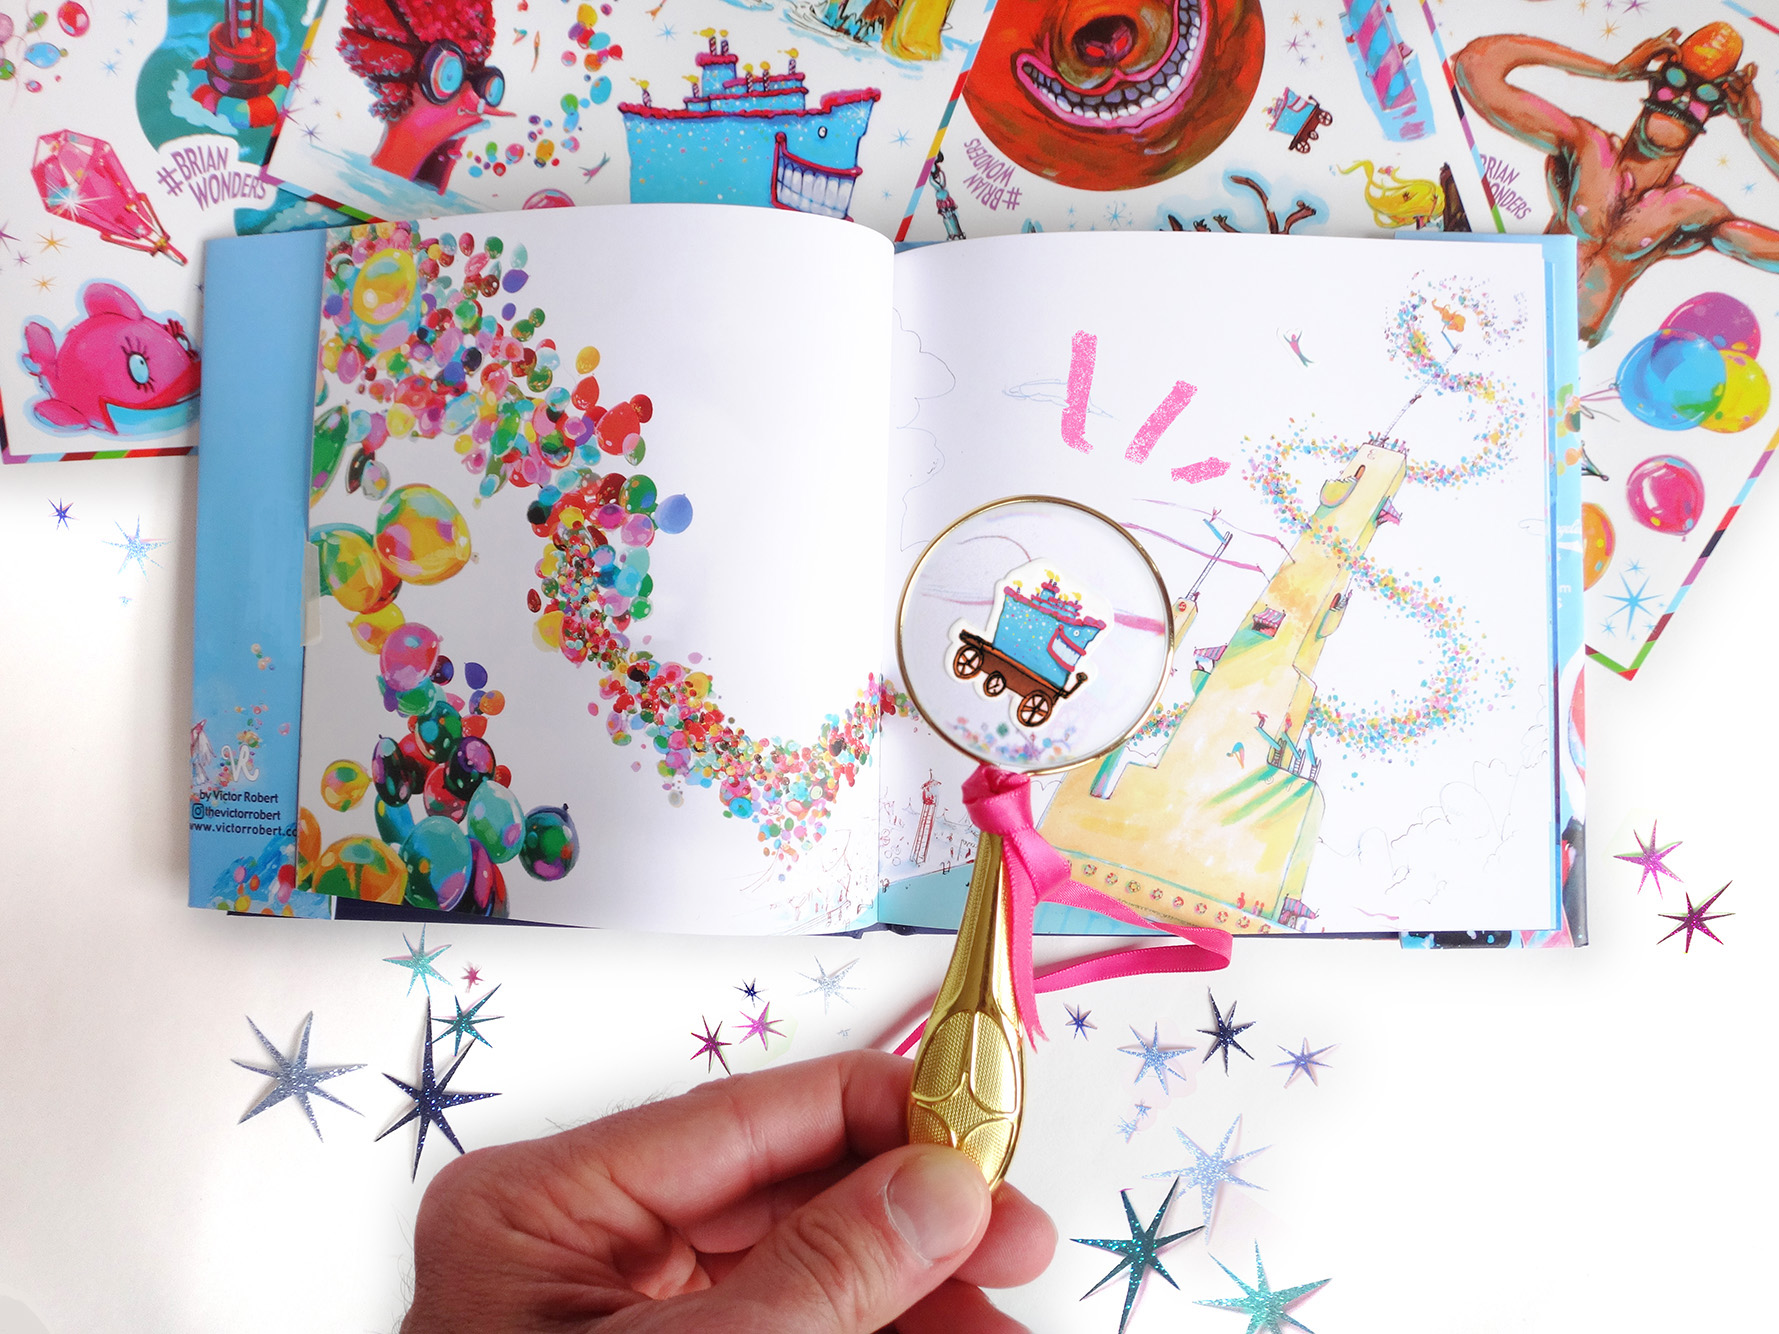 Brian Wonders Stickerbook - Edition of 1,000Wholesale price: $20MSRP: $45no minimum